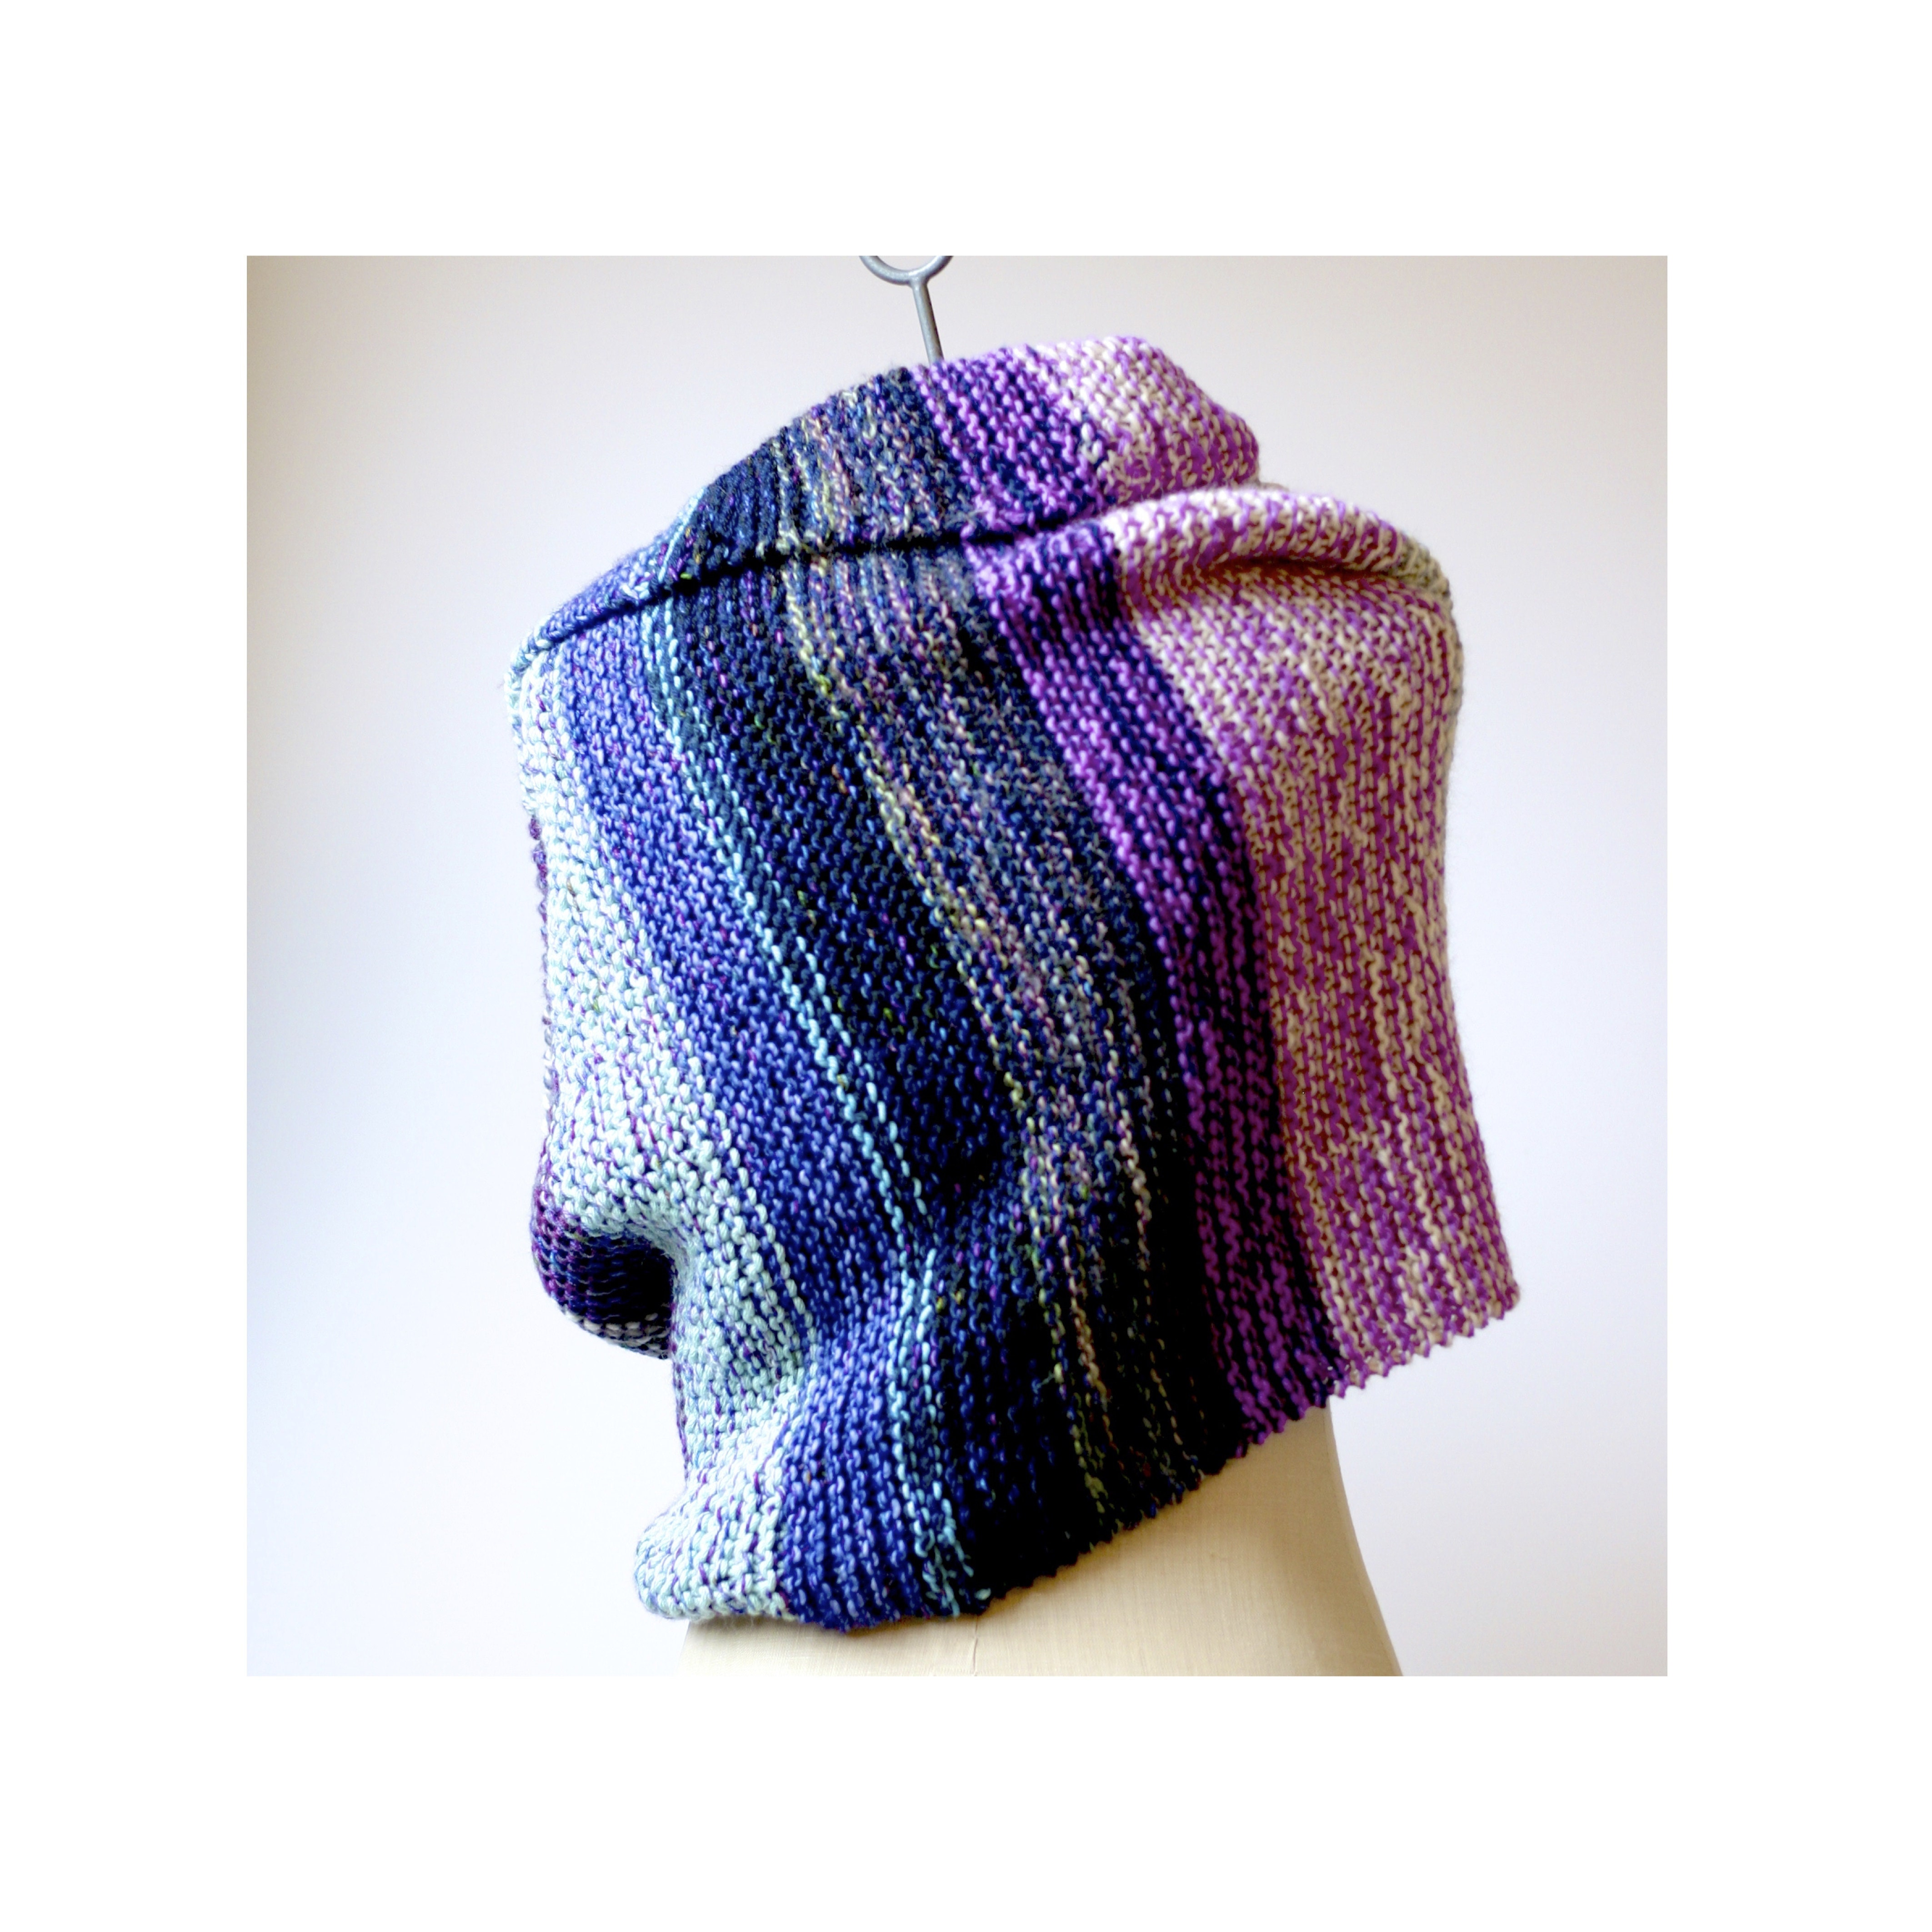 Knitting Wearable Art : Hand knit wearable art by amylaroux on etsy